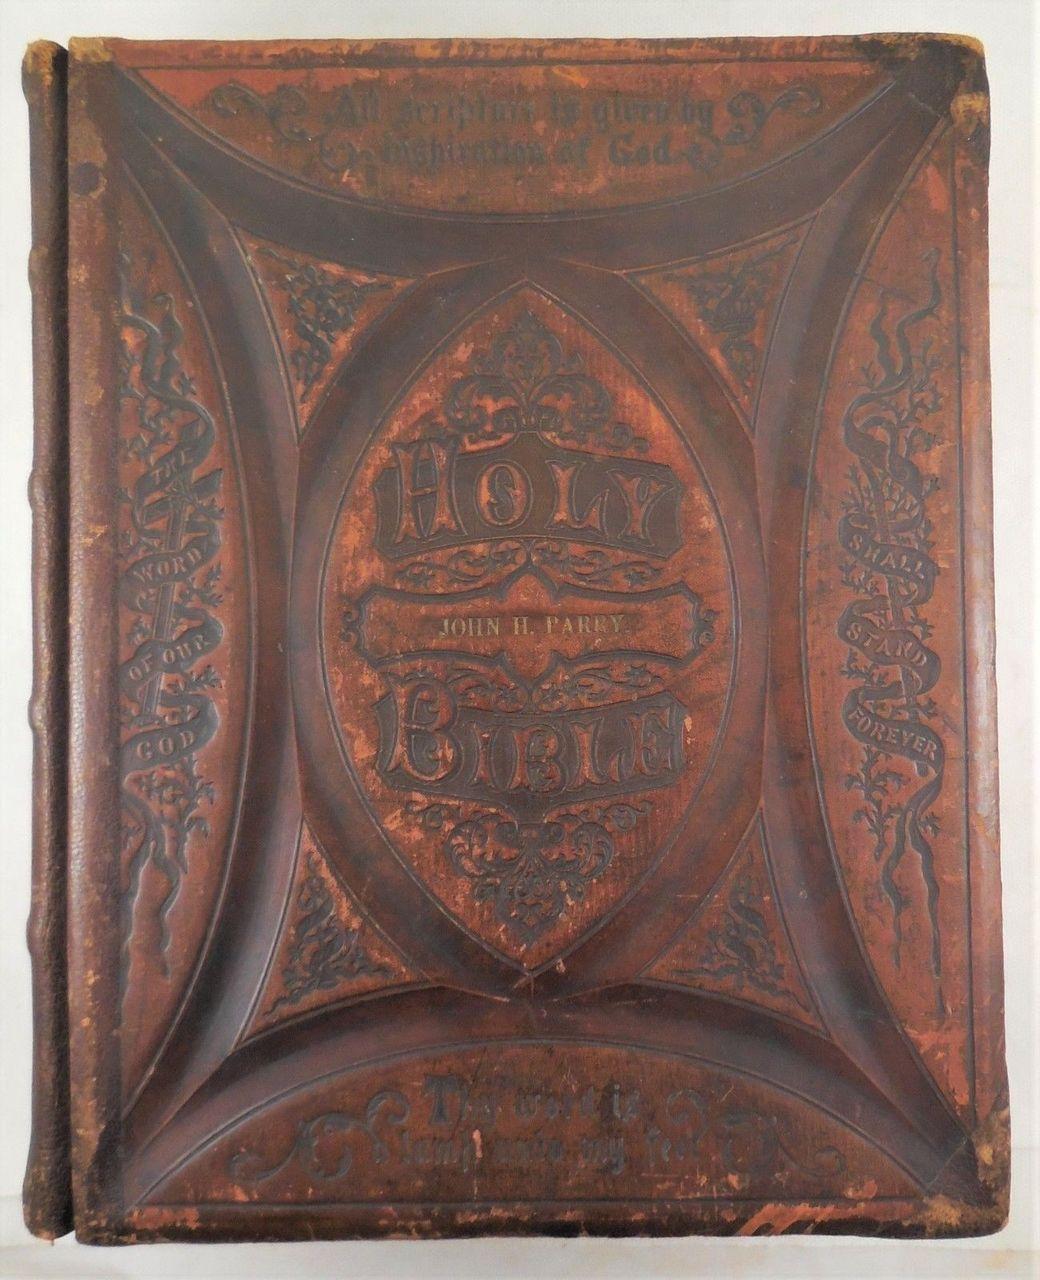 THE LATEST ILLUSTRATED POLYGLOT FAMILY BIBLE - 1872 [Custom Binding]